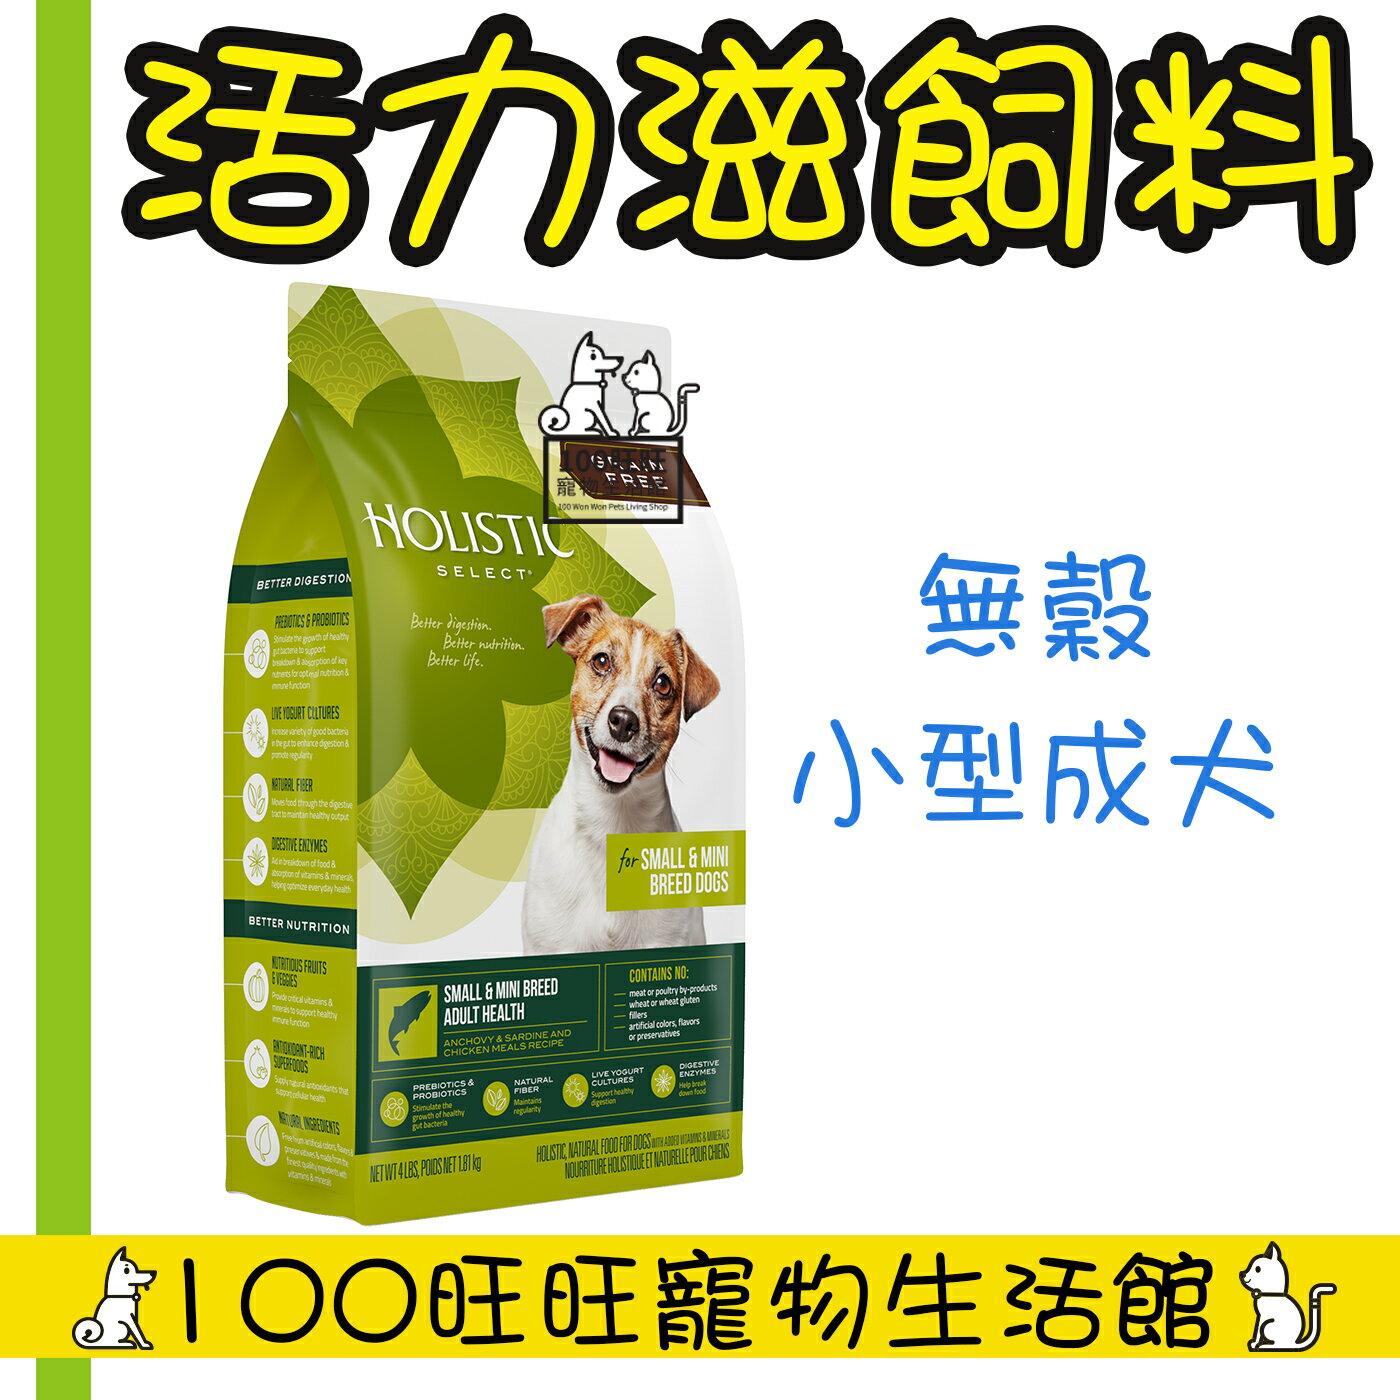 Holistic Select 活力滋 無穀小型成犬 低敏魚加雞挑嘴配方 4磅 1.81 kg